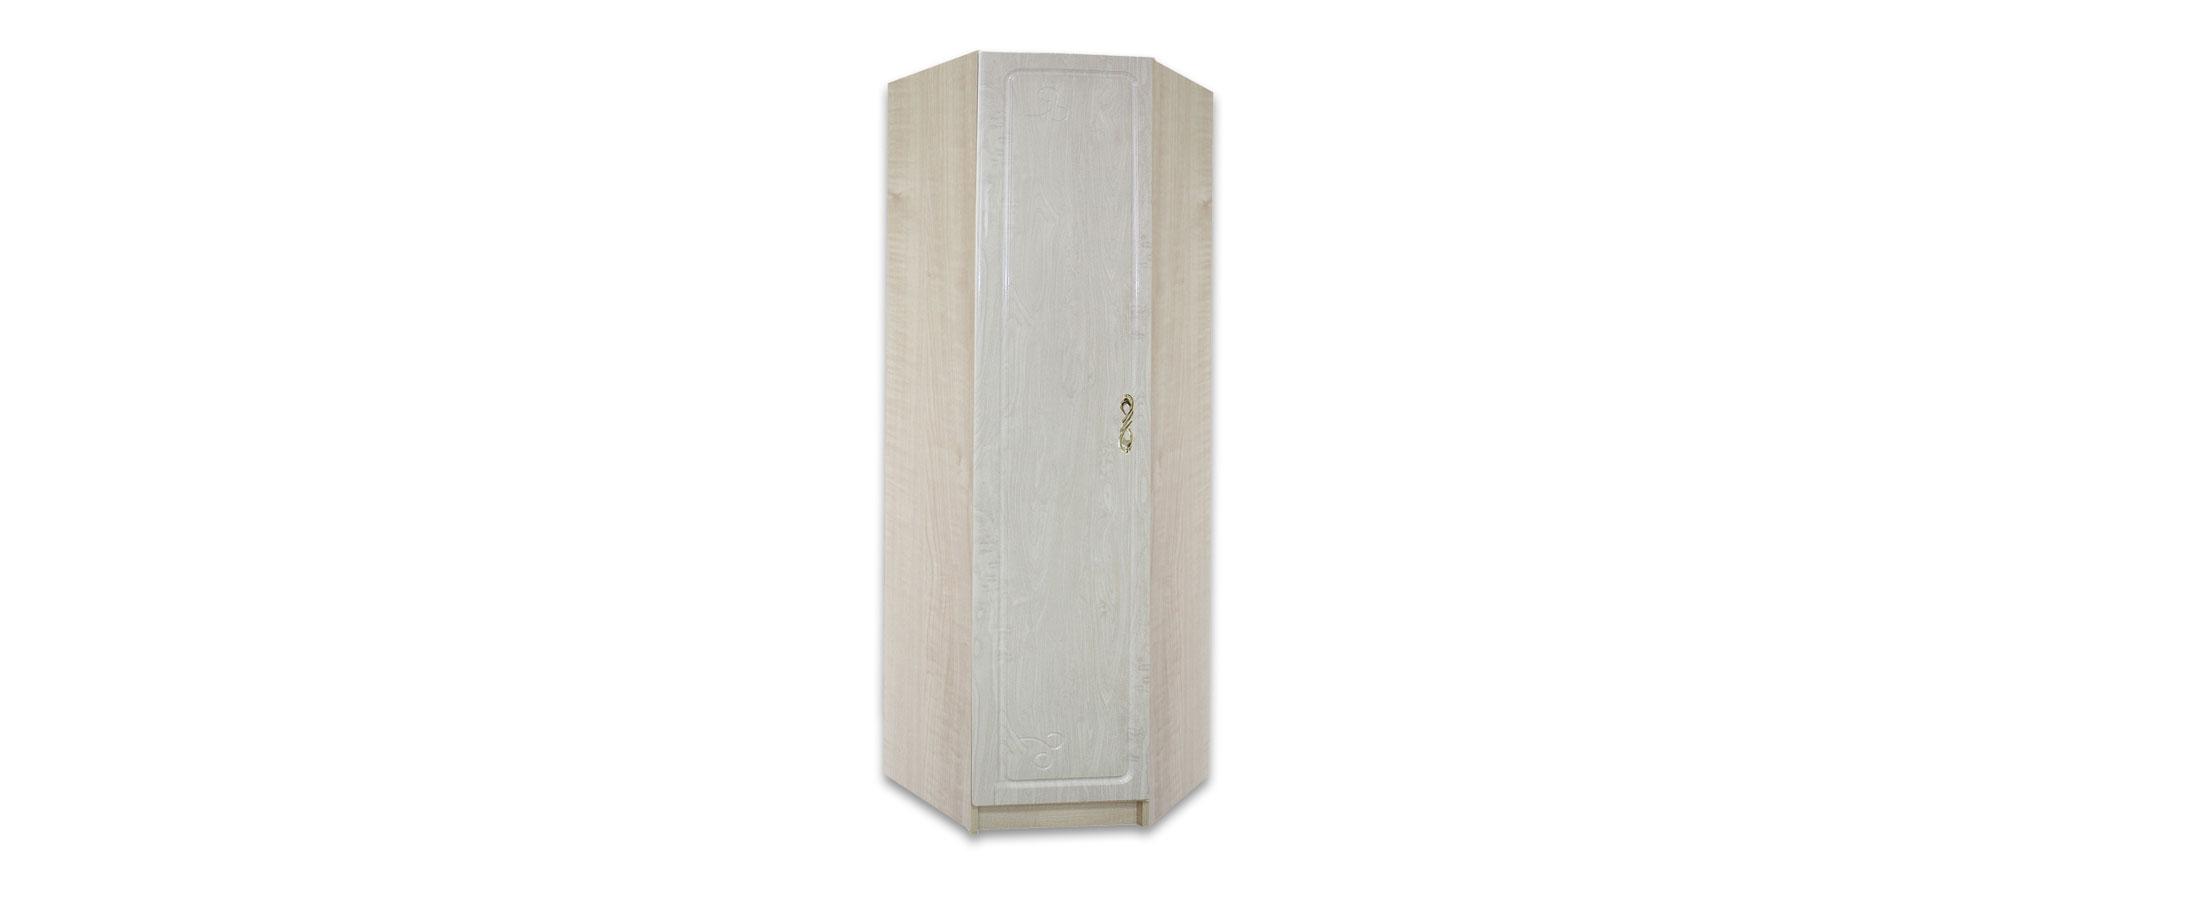 Шкаф угловой Афина-4 Клен Модель 509 от MOON TRADE